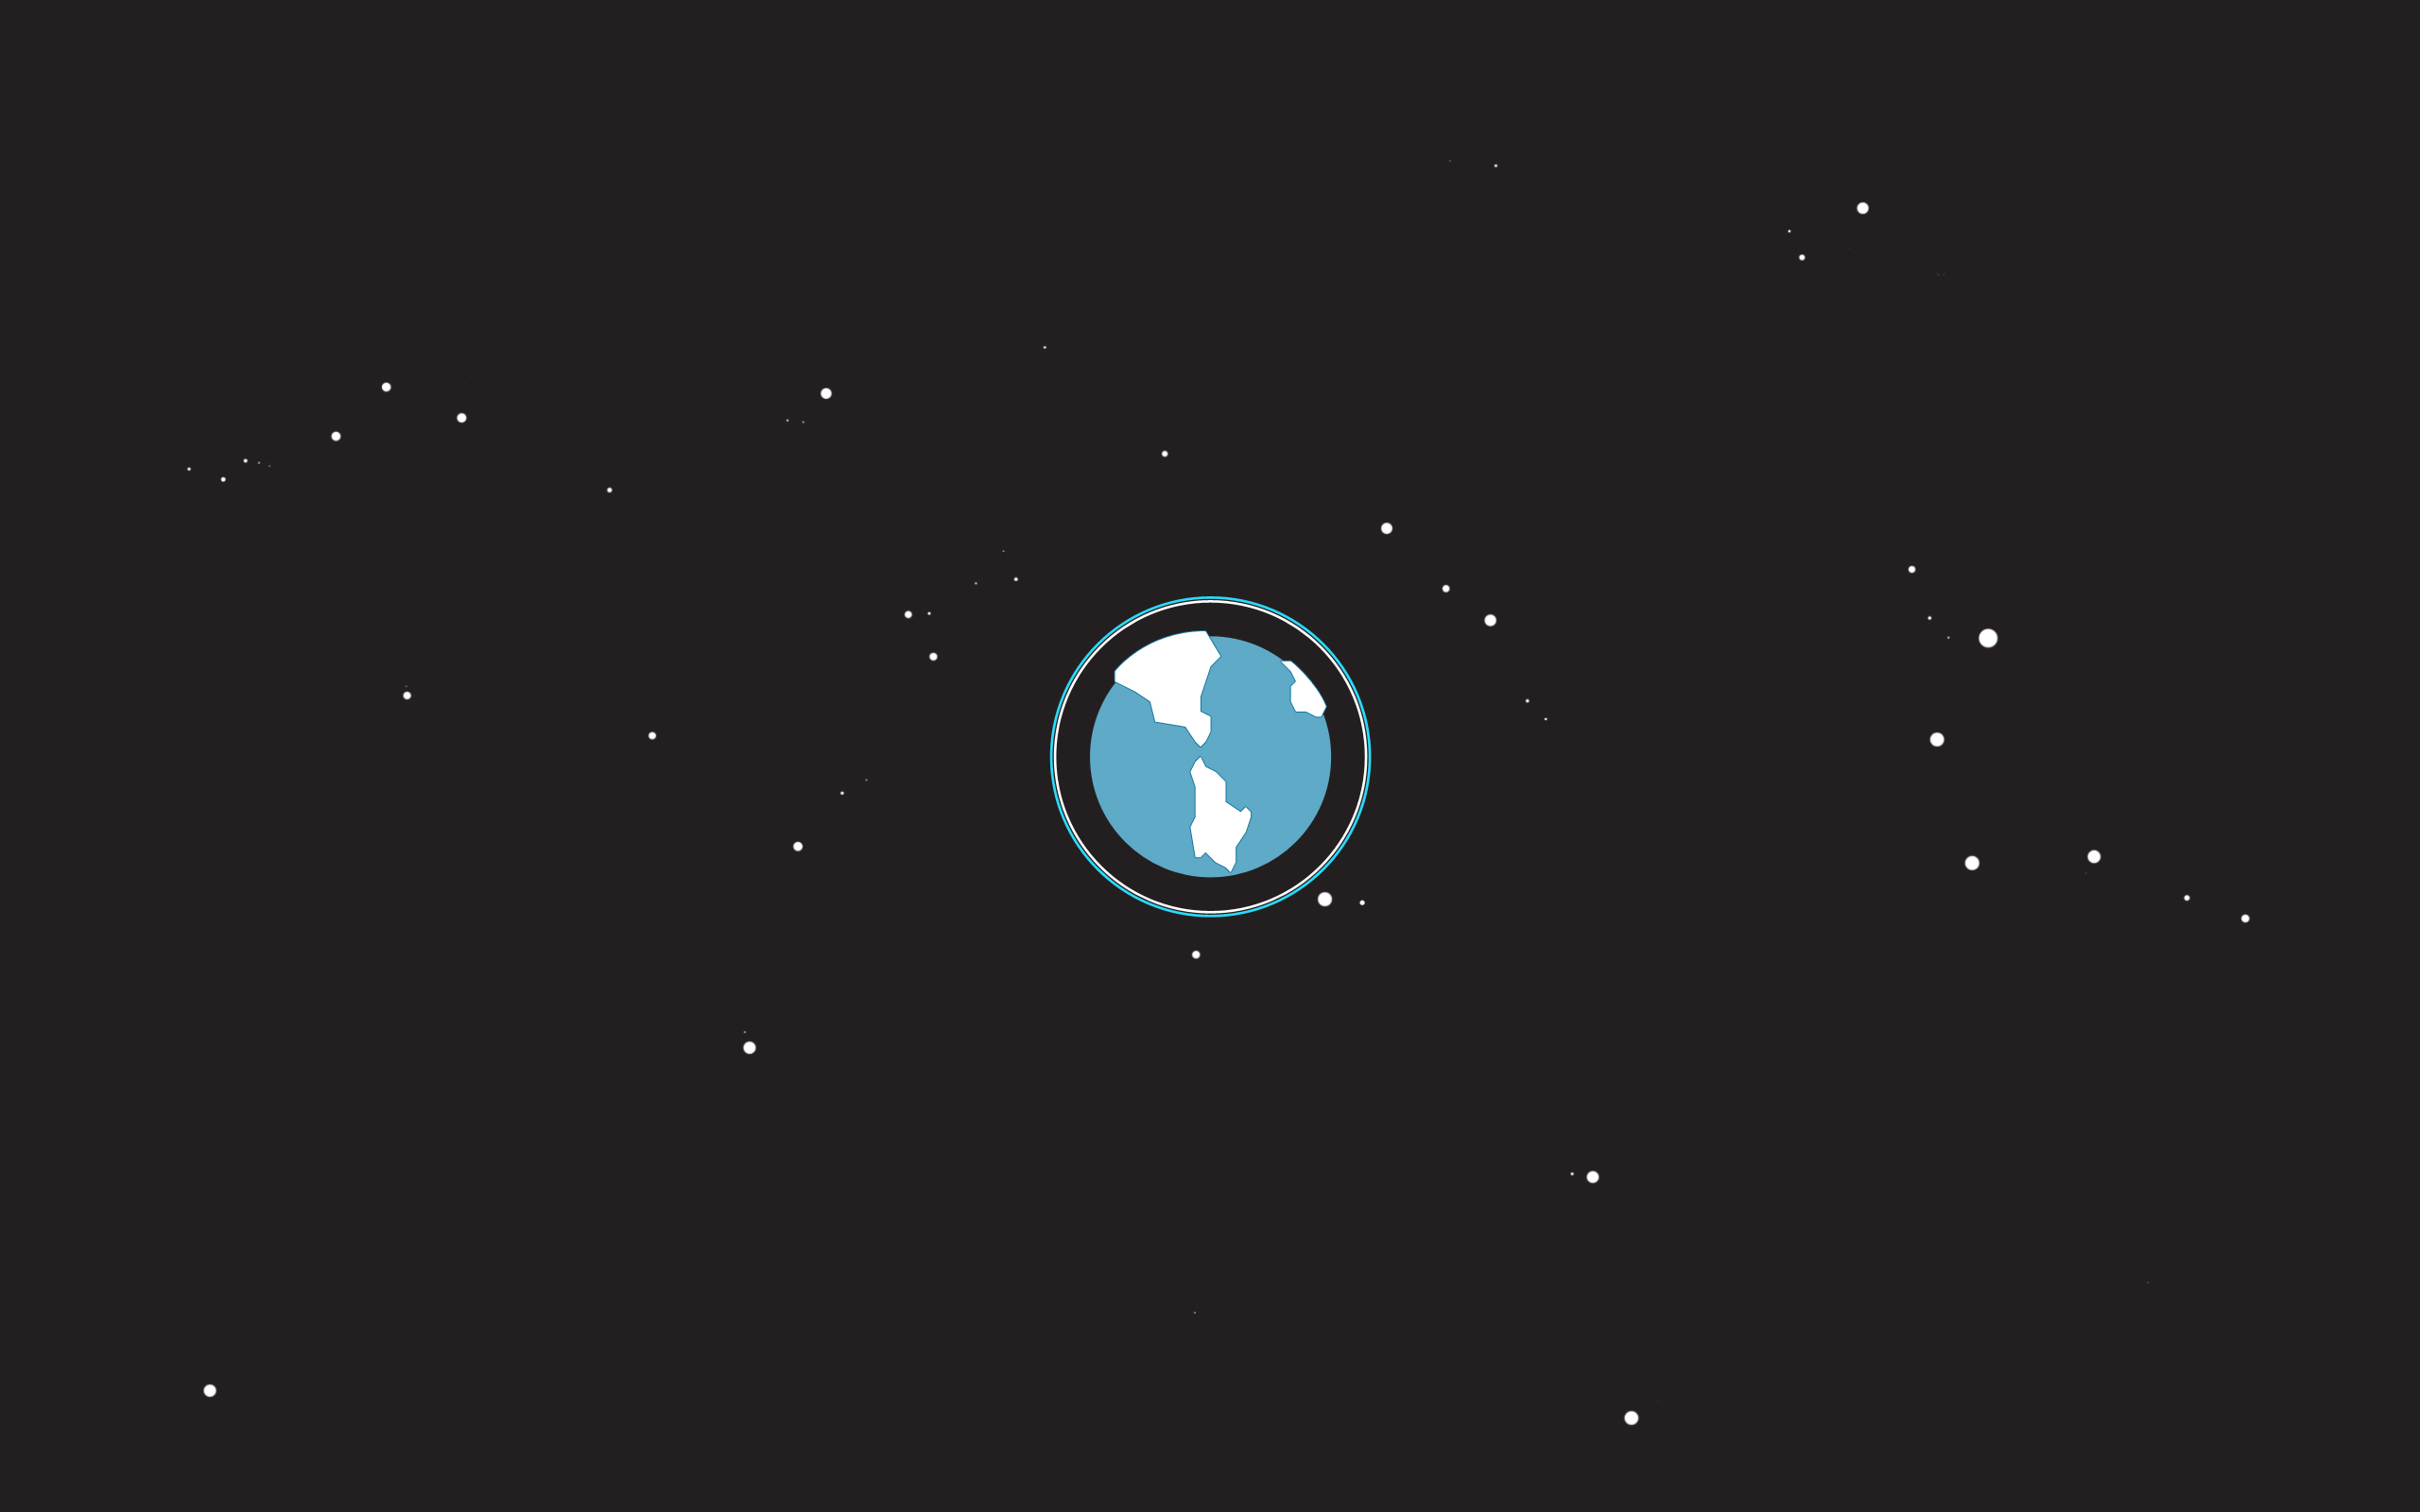 Simple Space Wallpaper